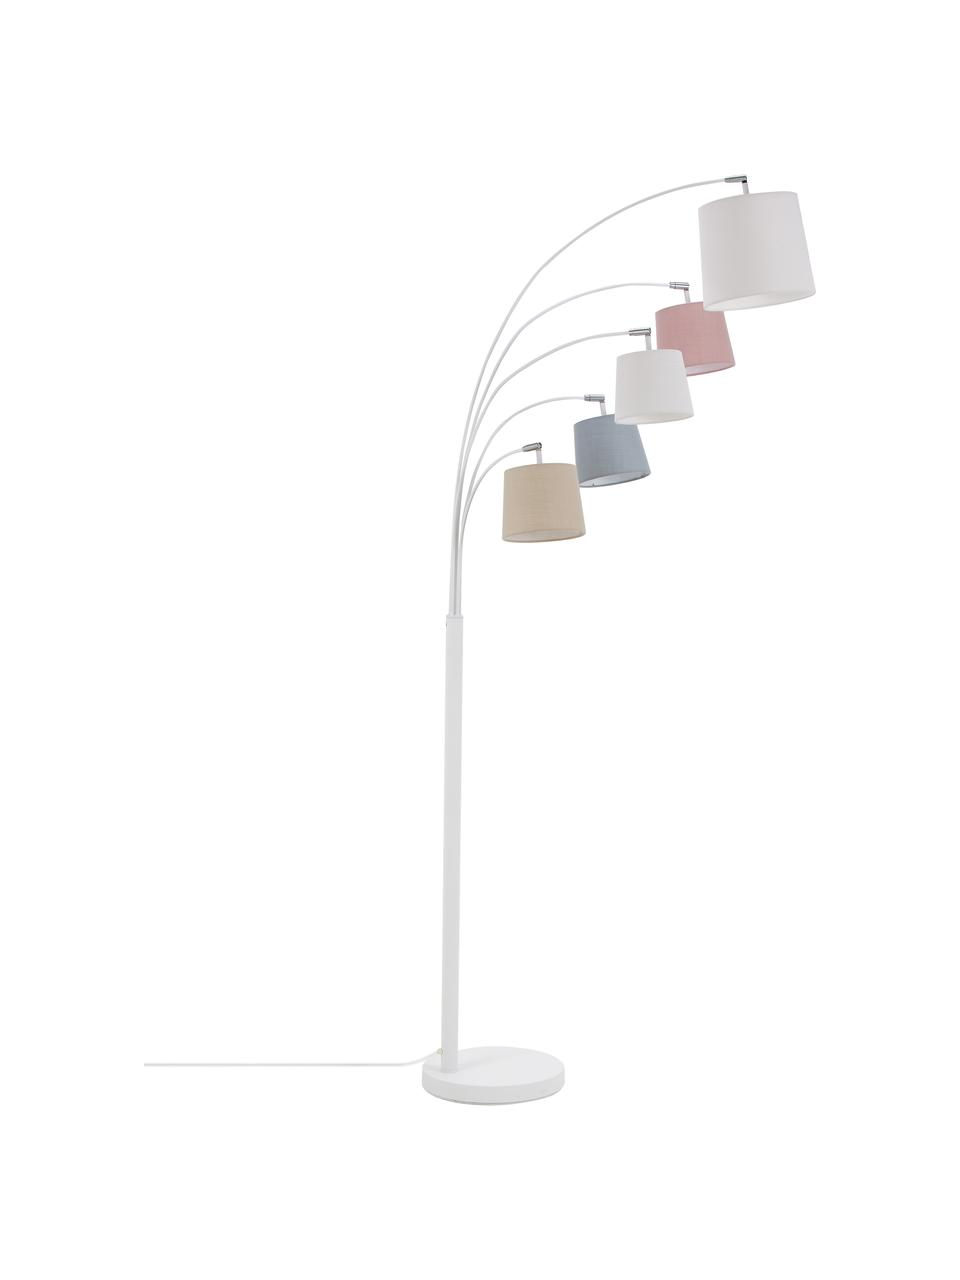 Grote verstelbare booglamp Foggy, Lampenkap: polyester, katoen, Lampvoet: gelakt metaal, Wit, grijs, roze, 80 x 200 cm